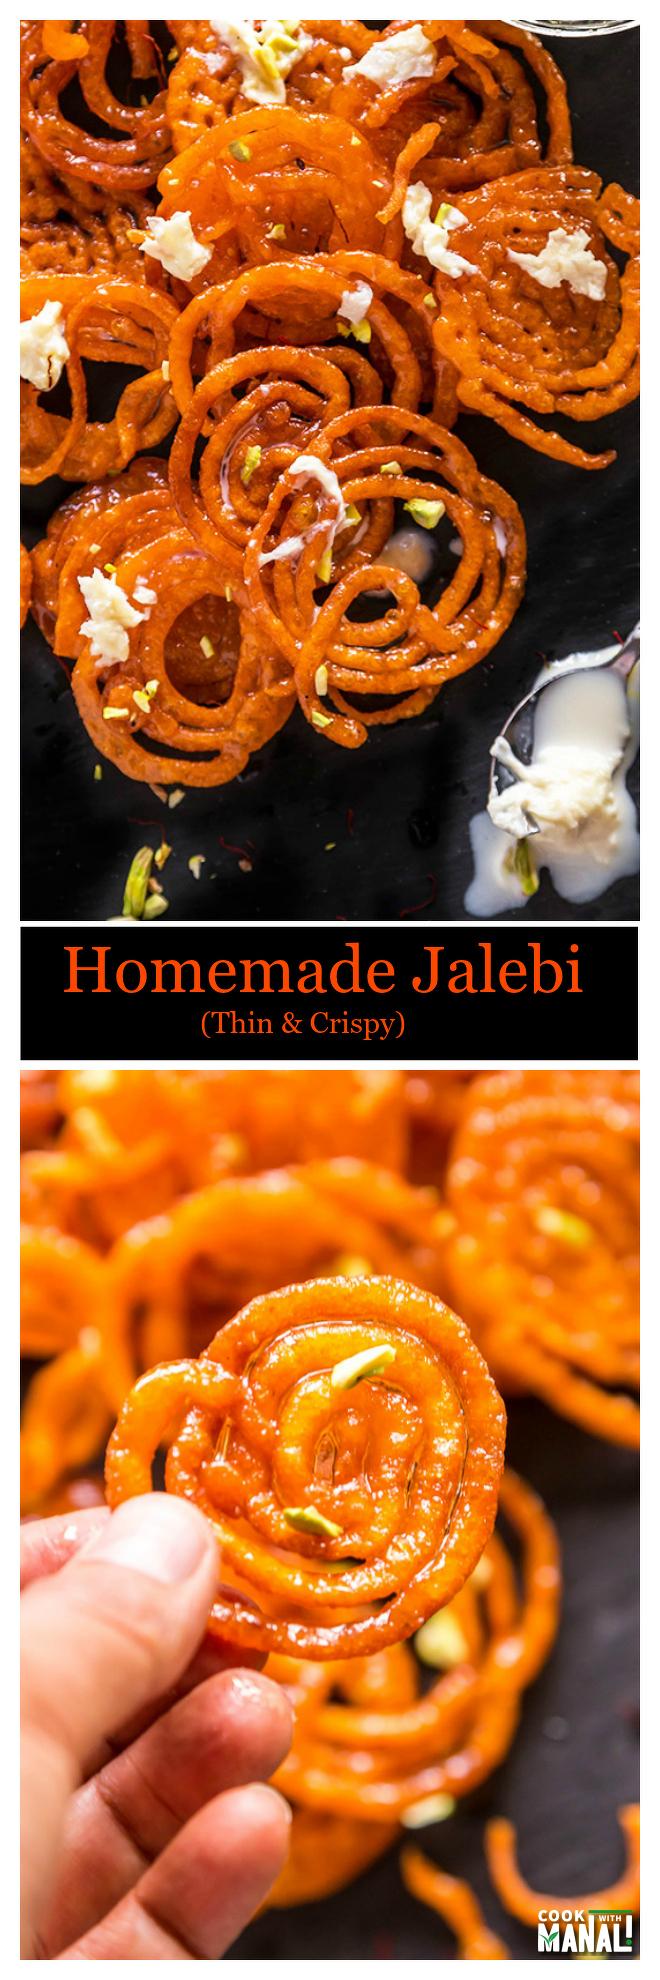 homemade-jalebi-collage